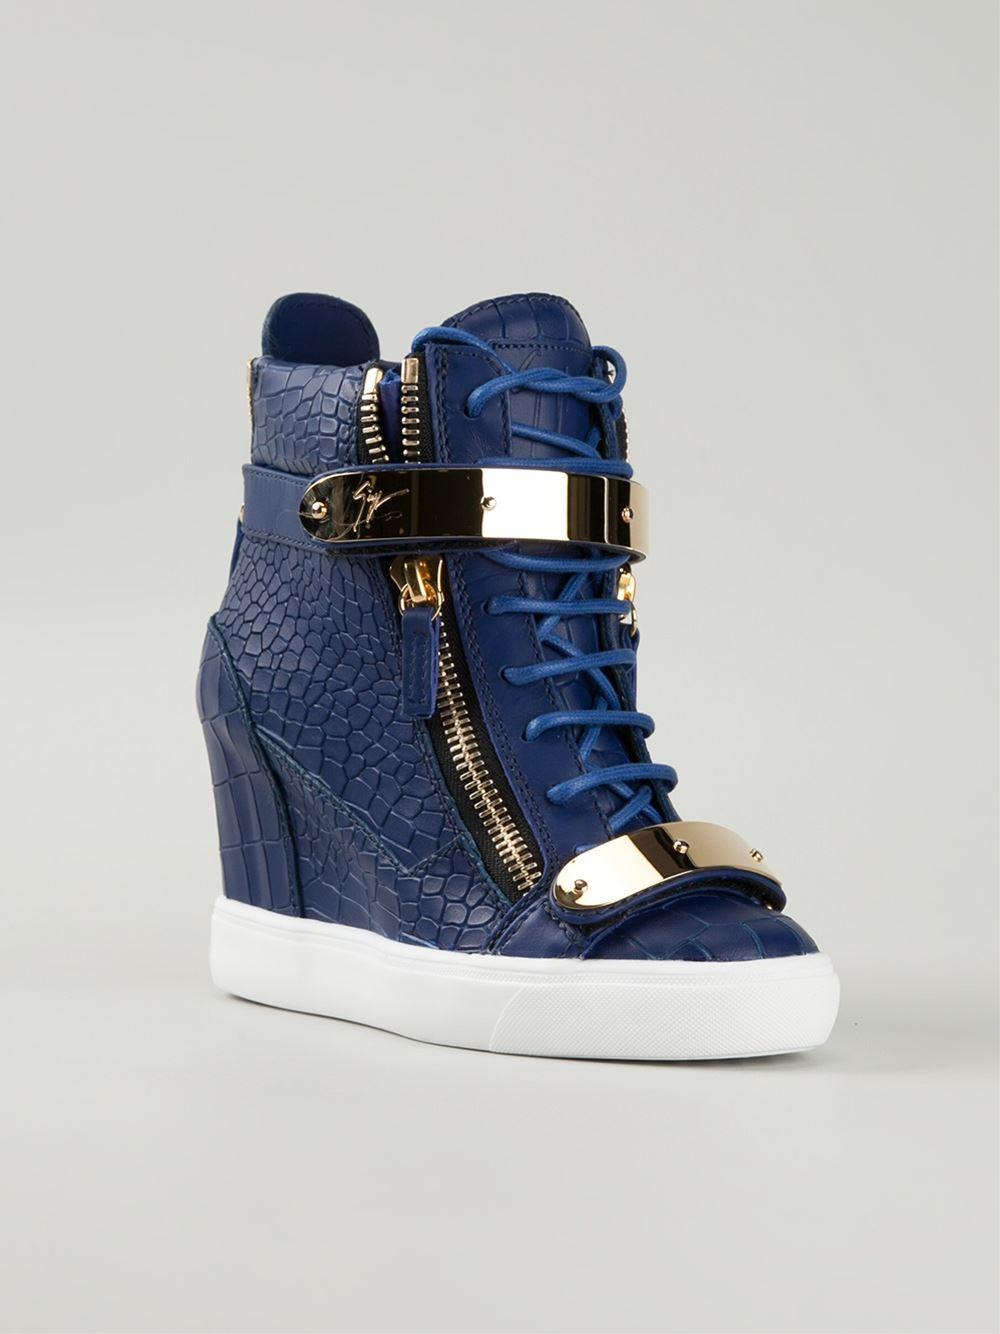 Giuseppe zanotti Wedge Hi-top Sneakers in Blue | Lyst